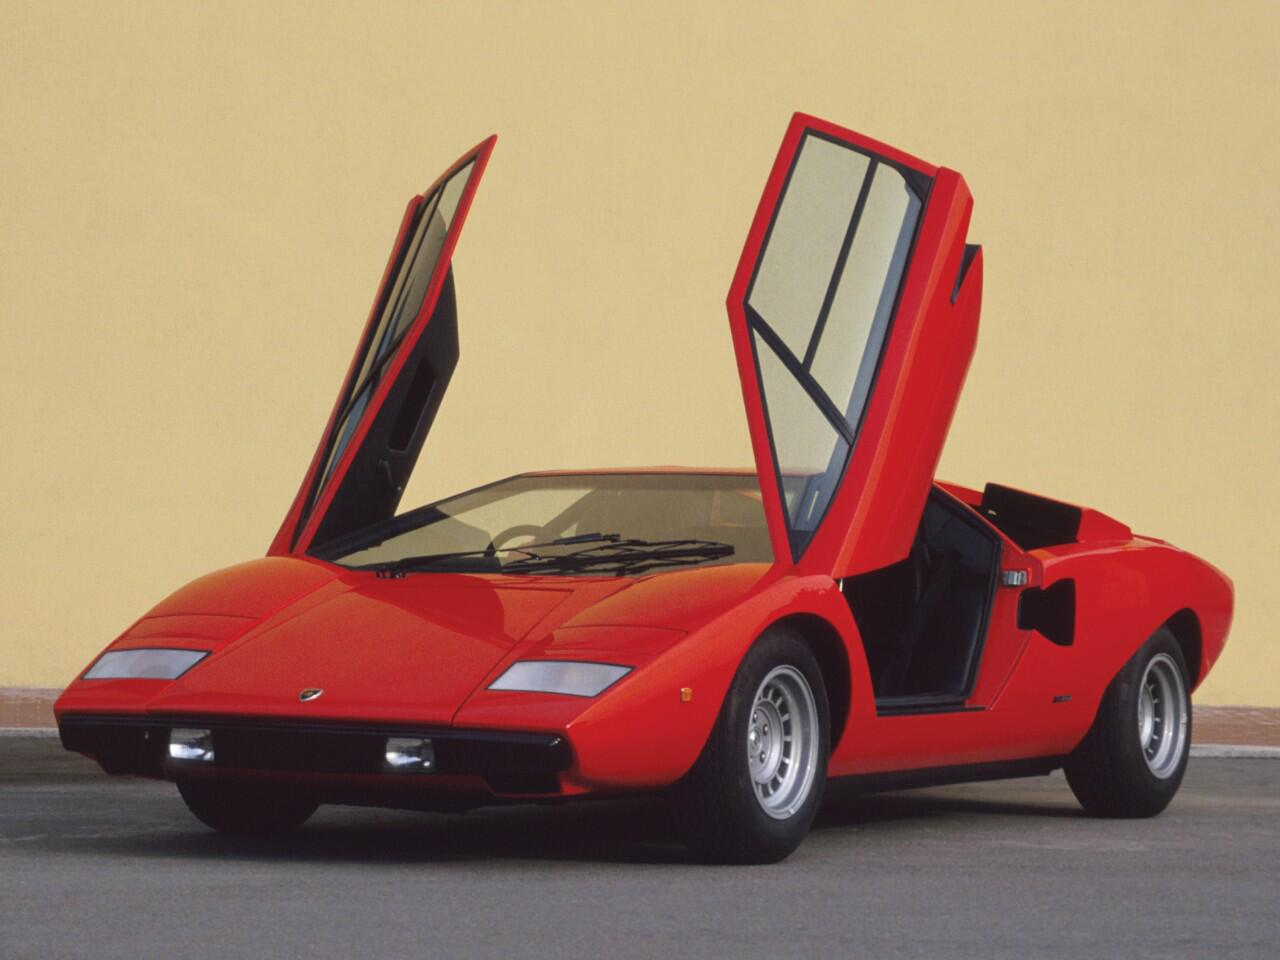 Bild zu Platz 4: Lamborghini Countach